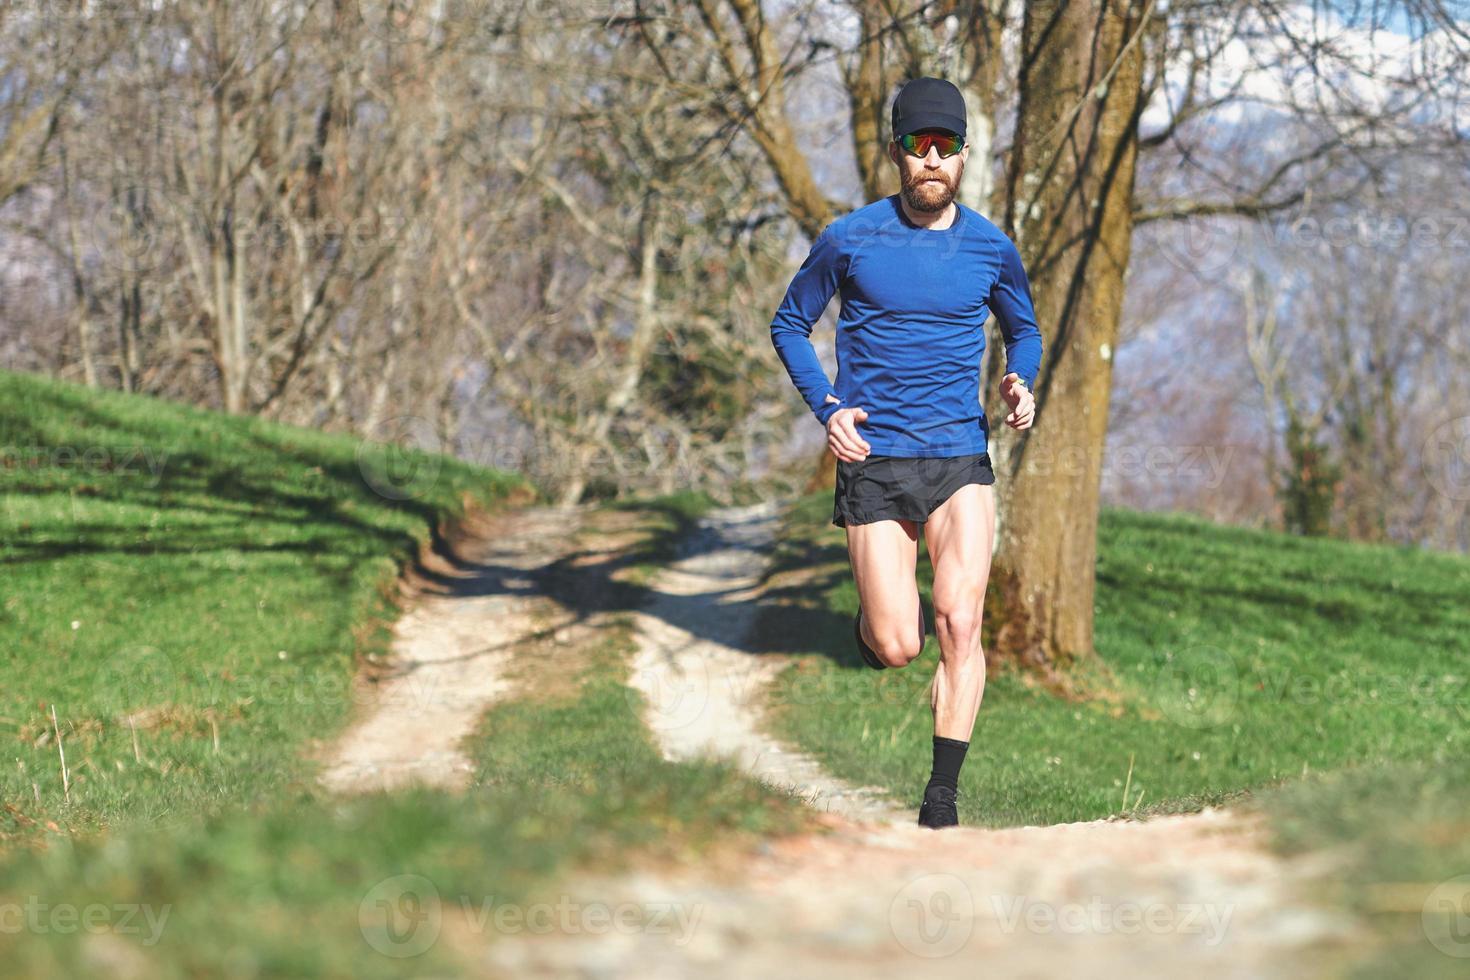 marathonloper op een parcours foto